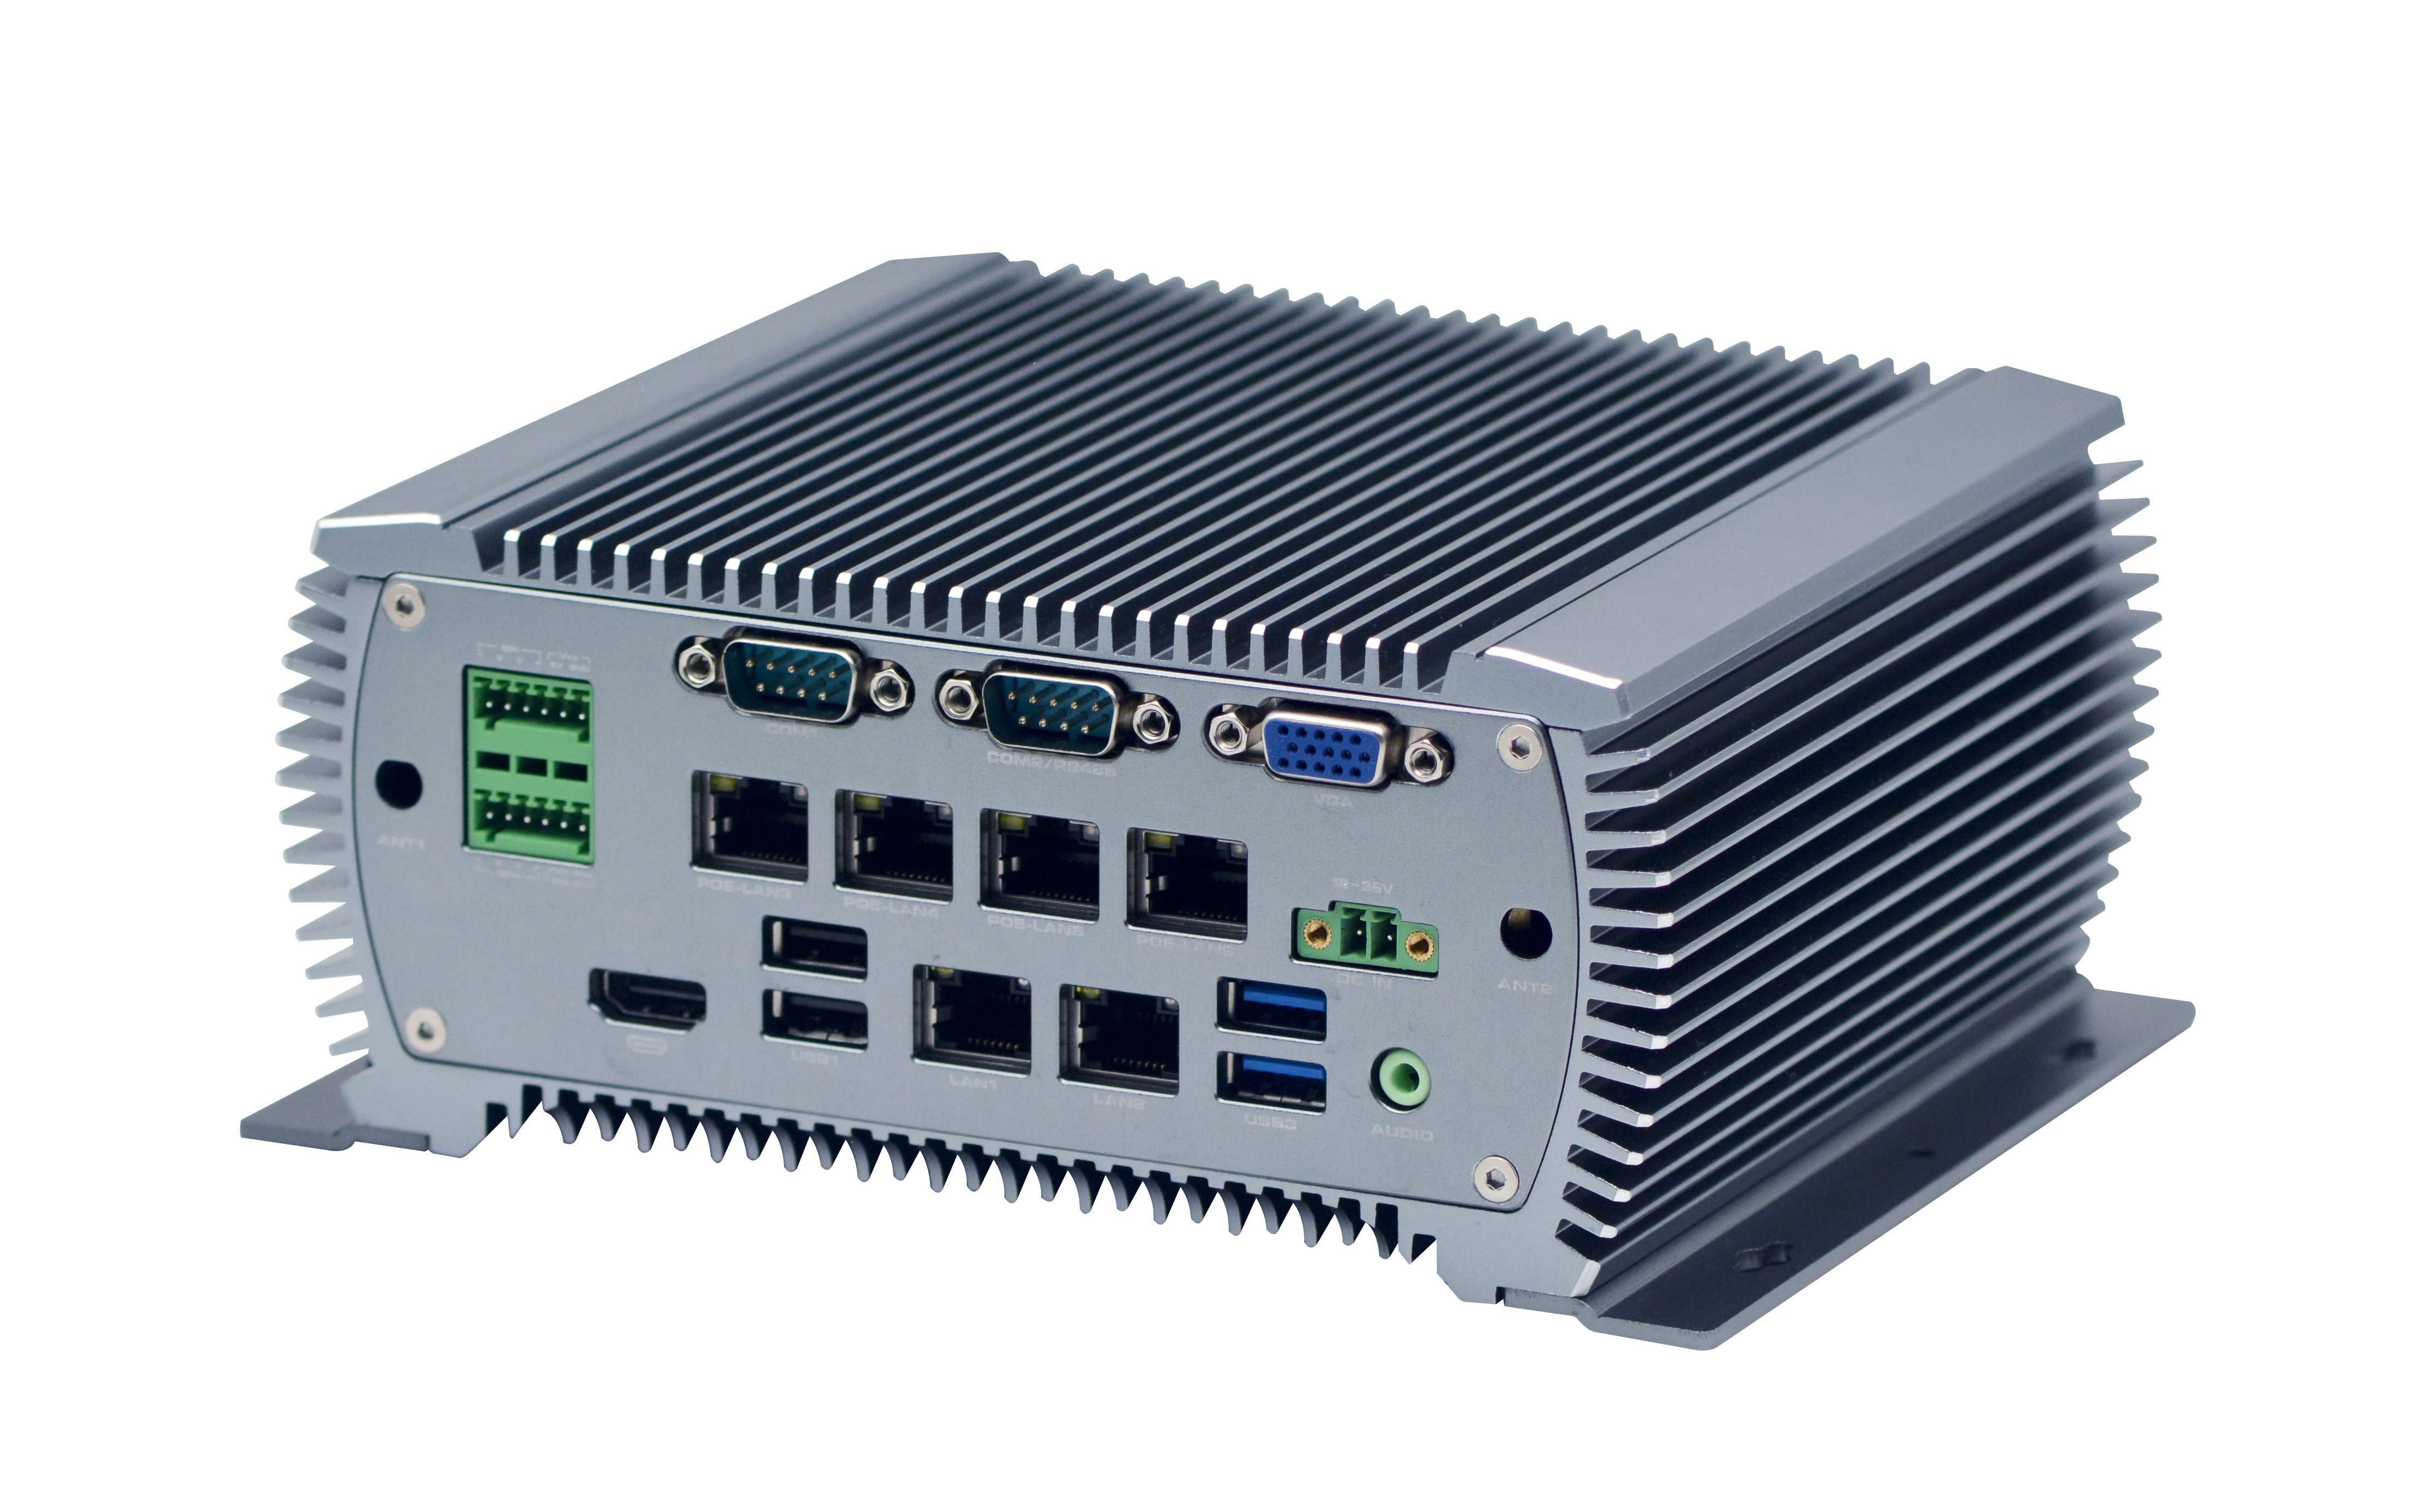 Industrial Mini Computer Mini PC Core I5 6360U 2.0GHZ 2*COM 6*LAN POE 6*USB HDMI Windows Linux Nettop Fanless